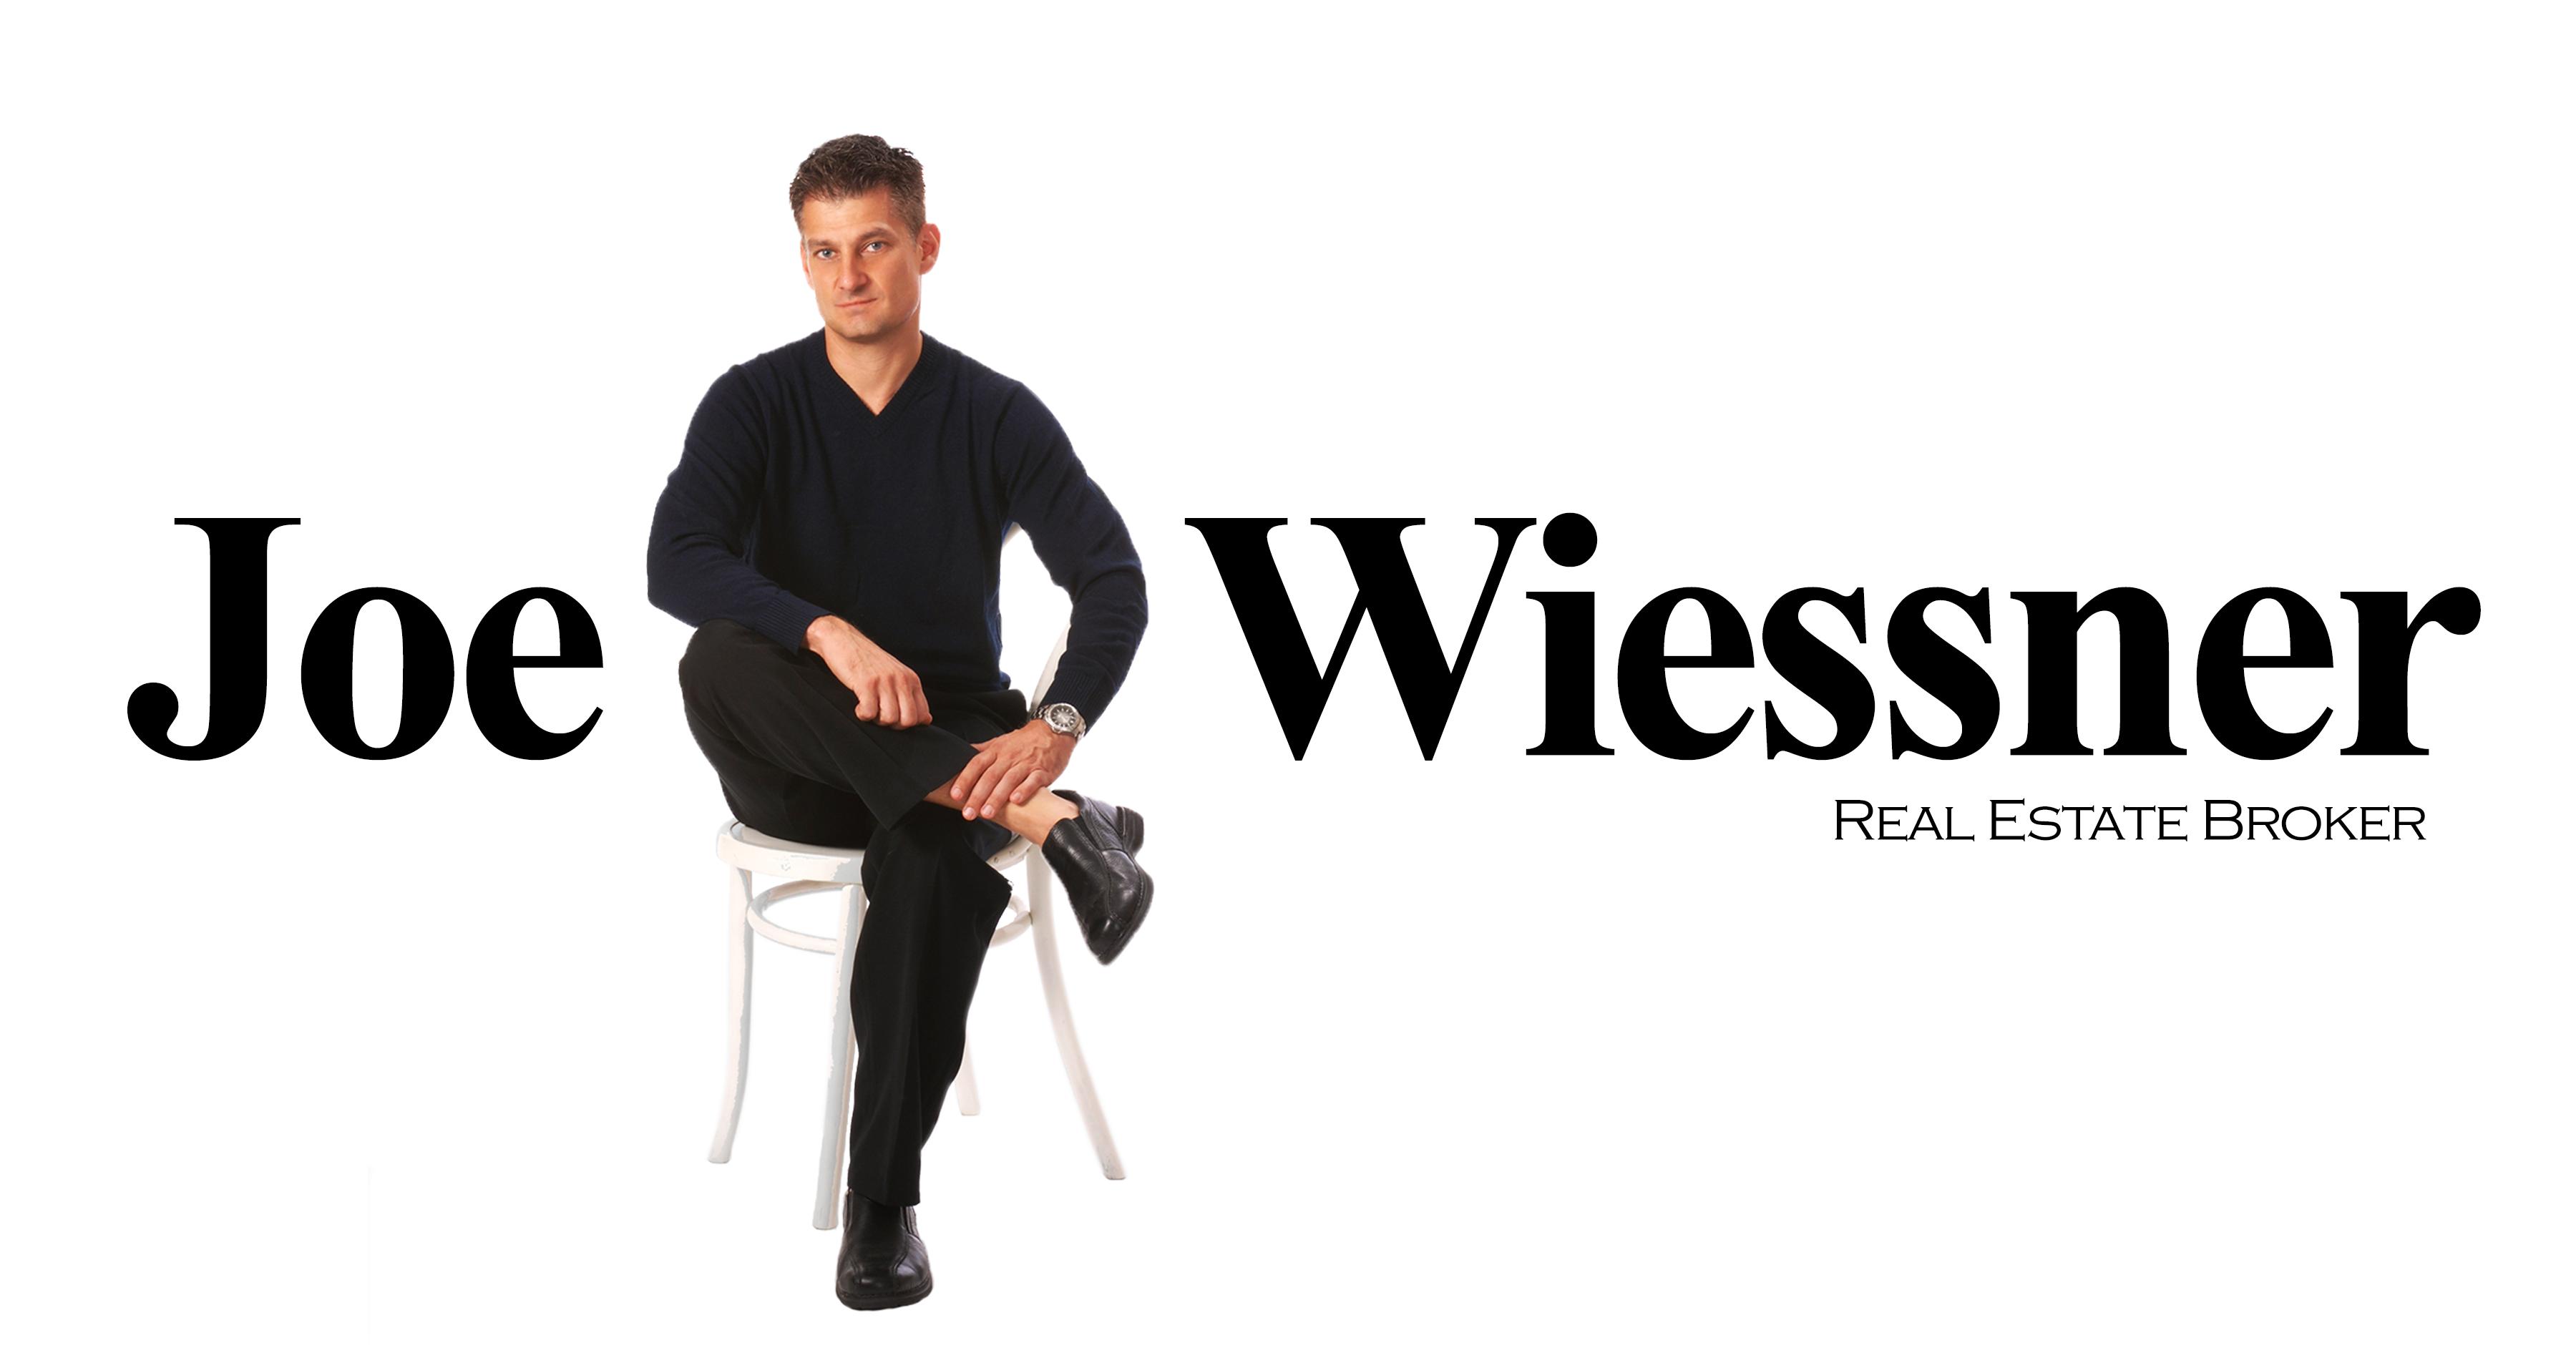 Joe Wiessner Bio